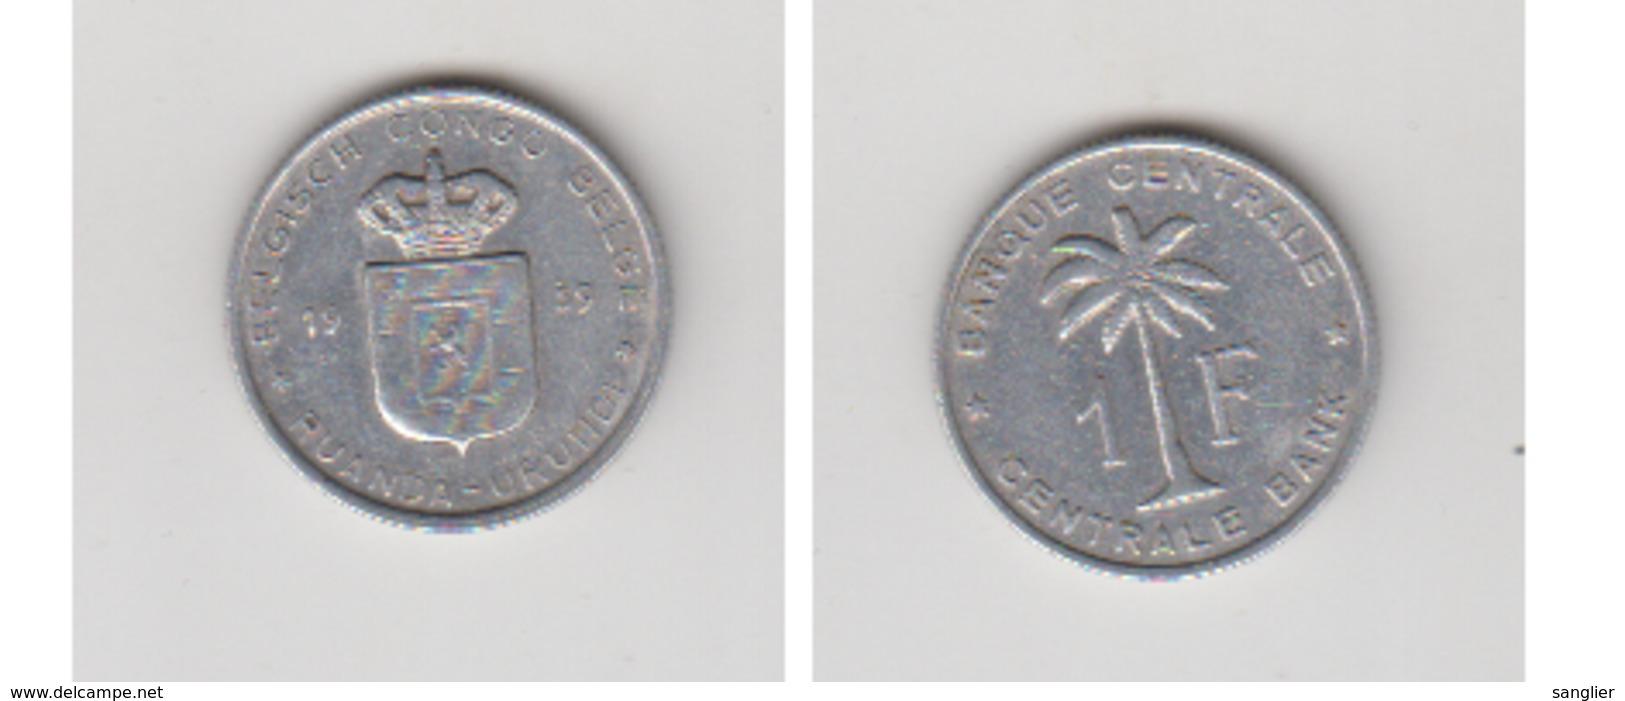 1959 BELGISCH CONGO - CONGO BELGE 1Fr RUANDA - 1951-1960: Baldovino I